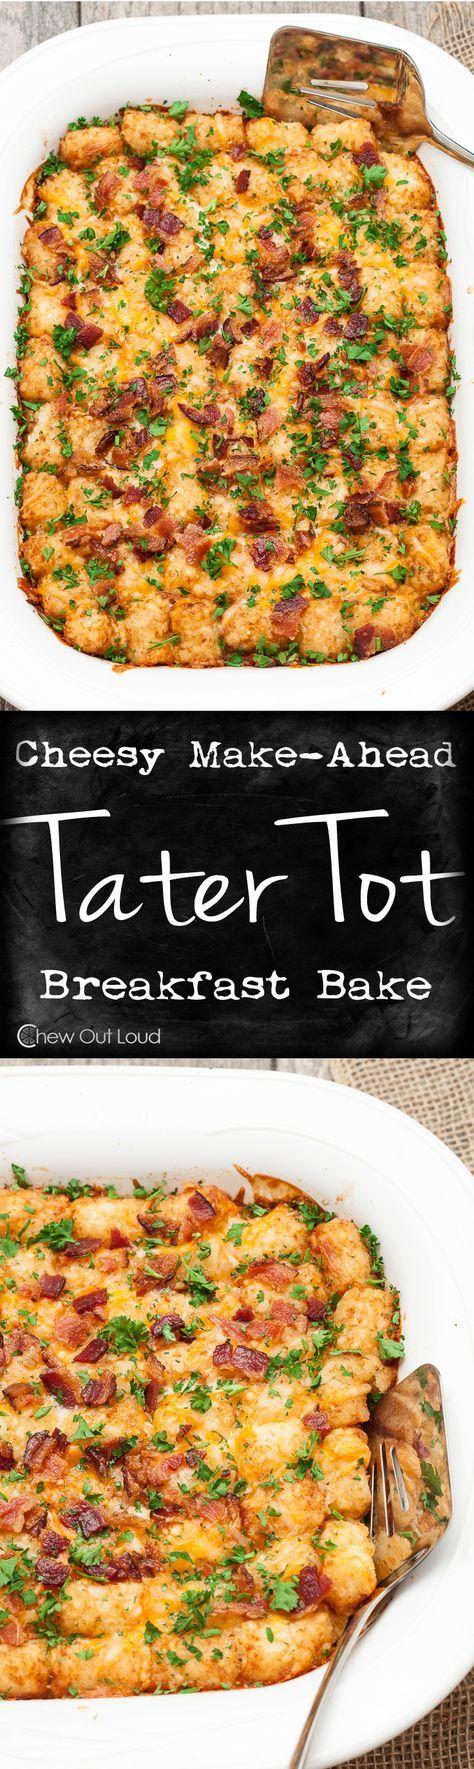 Cheesy Tater Tot Breakfast Bake. #dan330 http://livedan330.com/2015/07/12/cheesy-tater-tot-breakfast-bake/